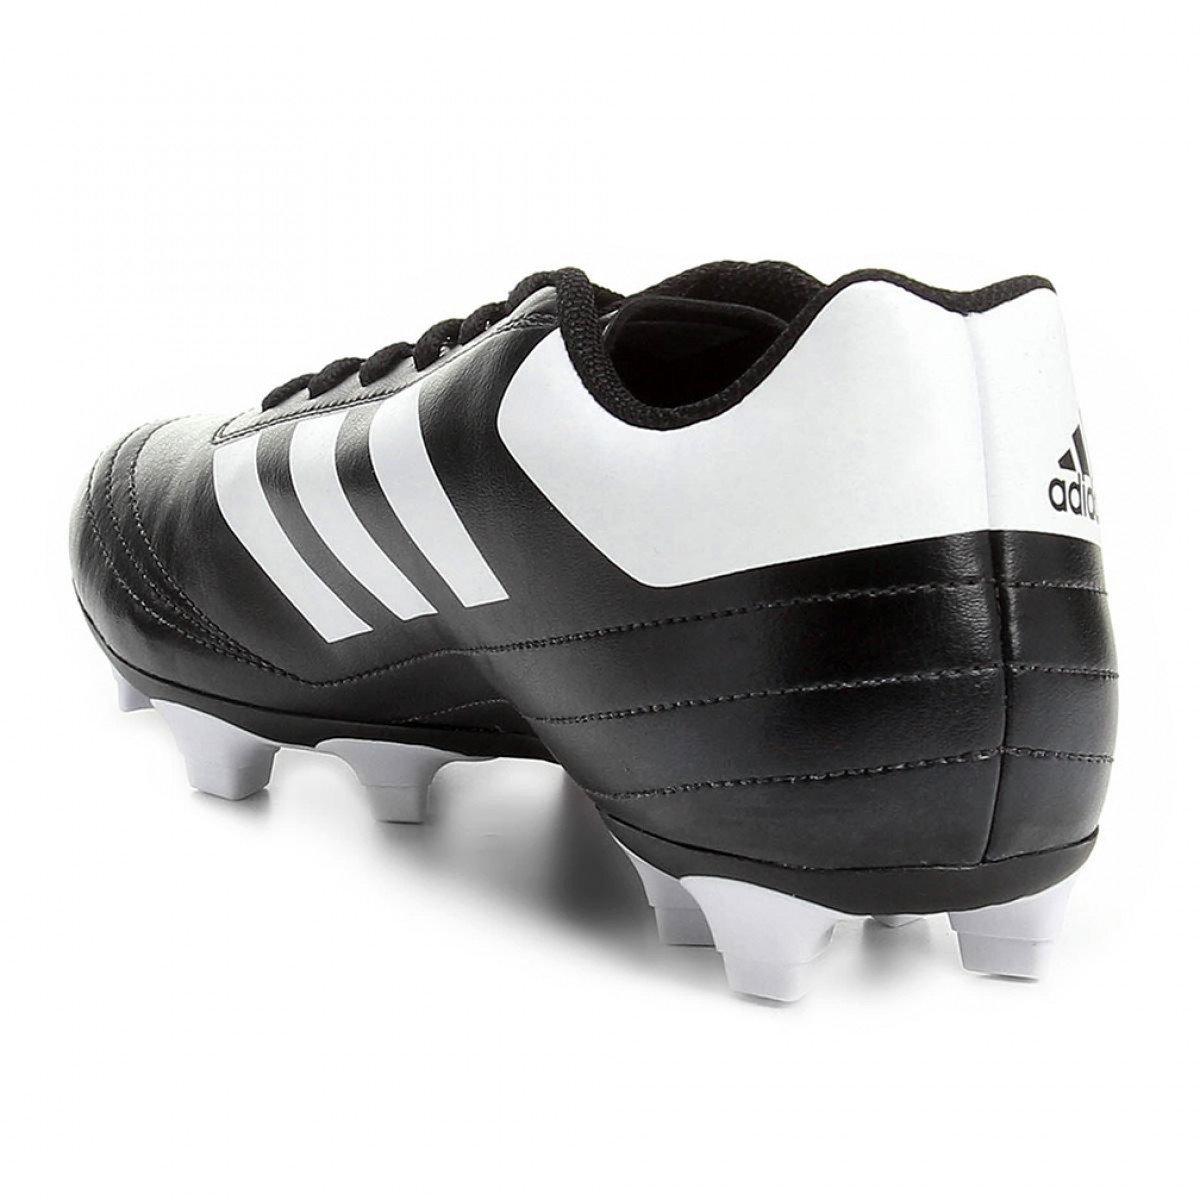 Chuteira Campo Adidas Goletto 6 FG Masculina Preta e Branca - Compre ... 2b46d71e898a5